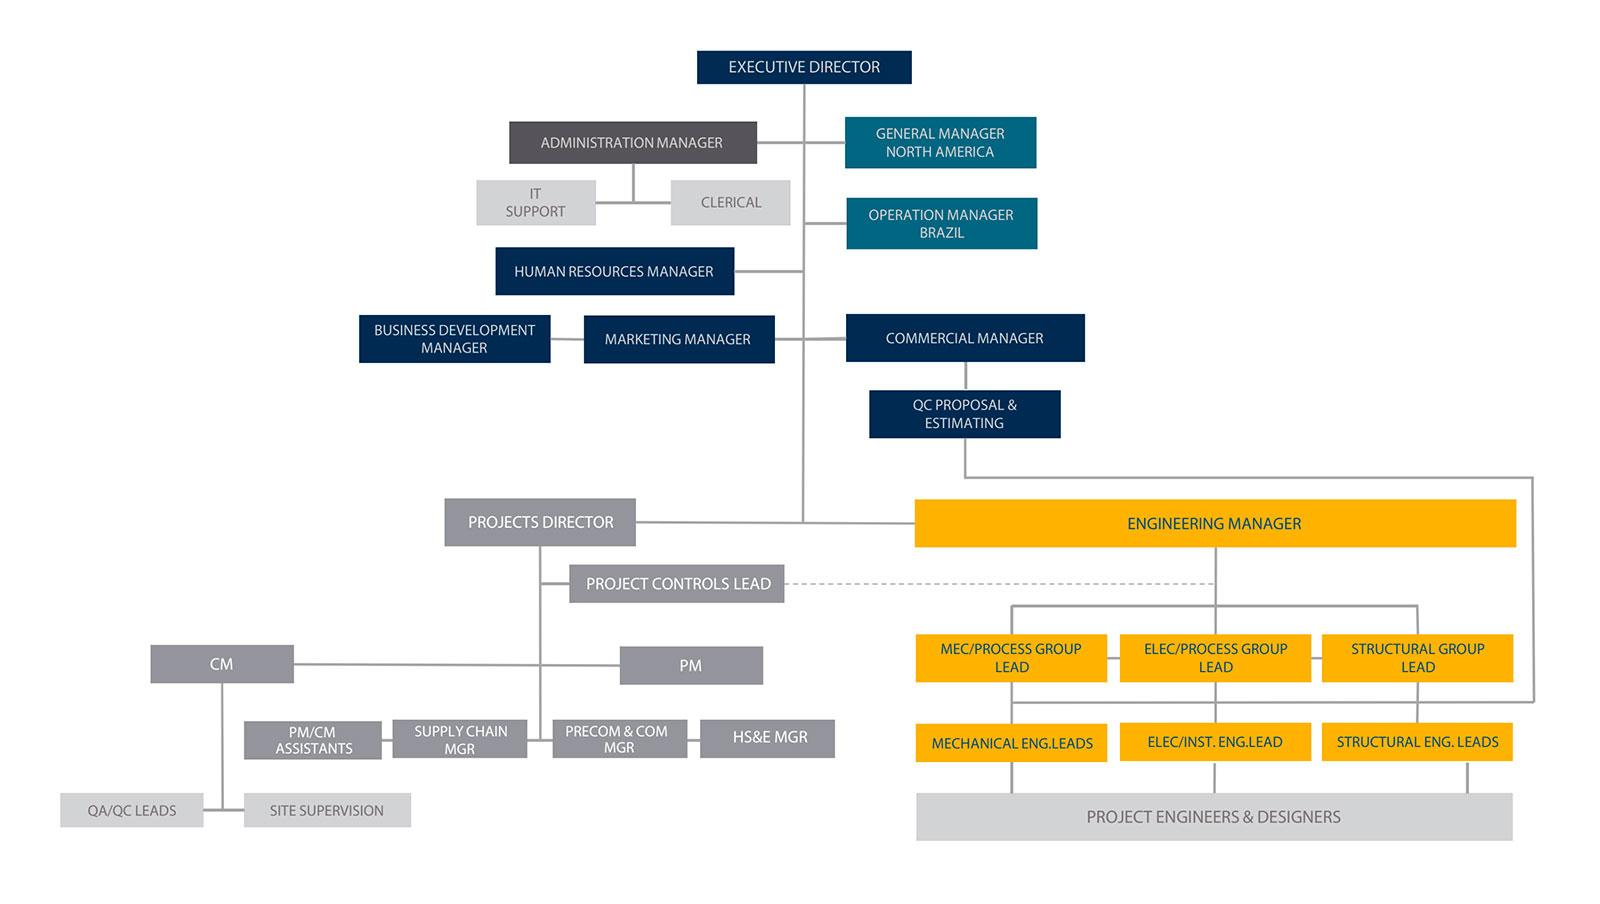 organization-chart-south-america-cement-saxum-mineria-industria-construccion-empresas-ingeniería-argentina-litio-cementera